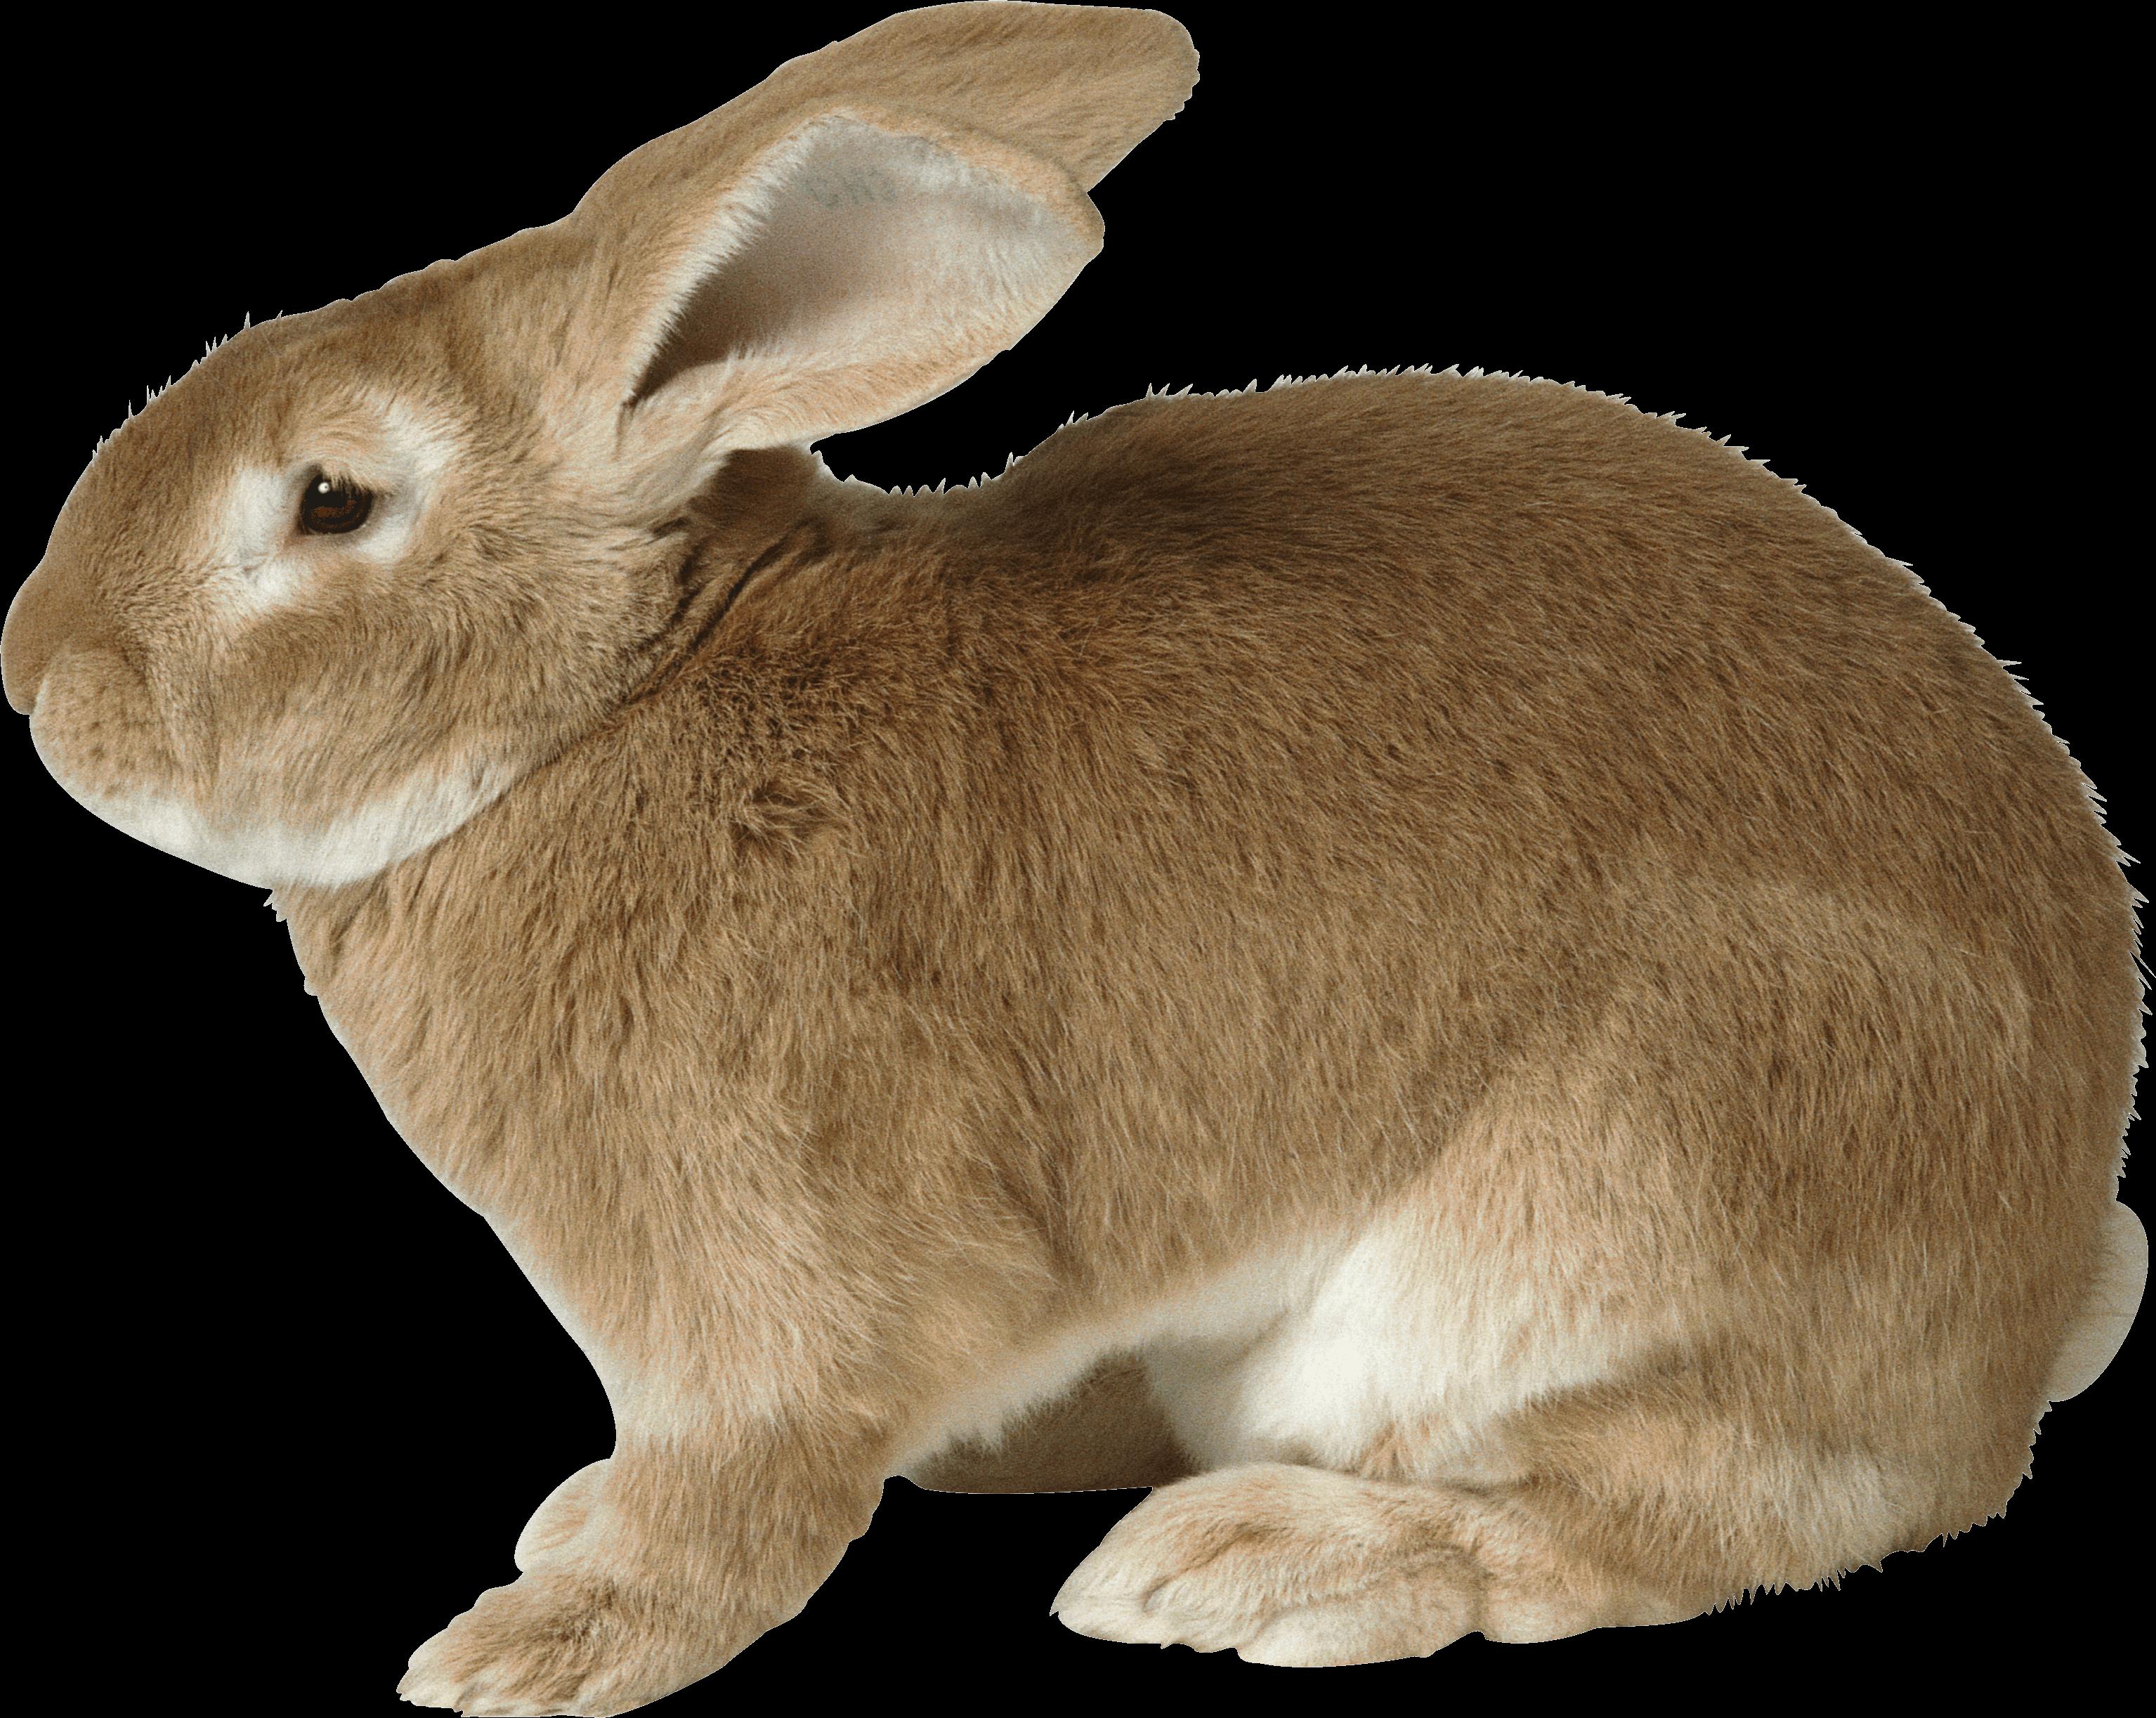 sad brown rabbit PNG Image